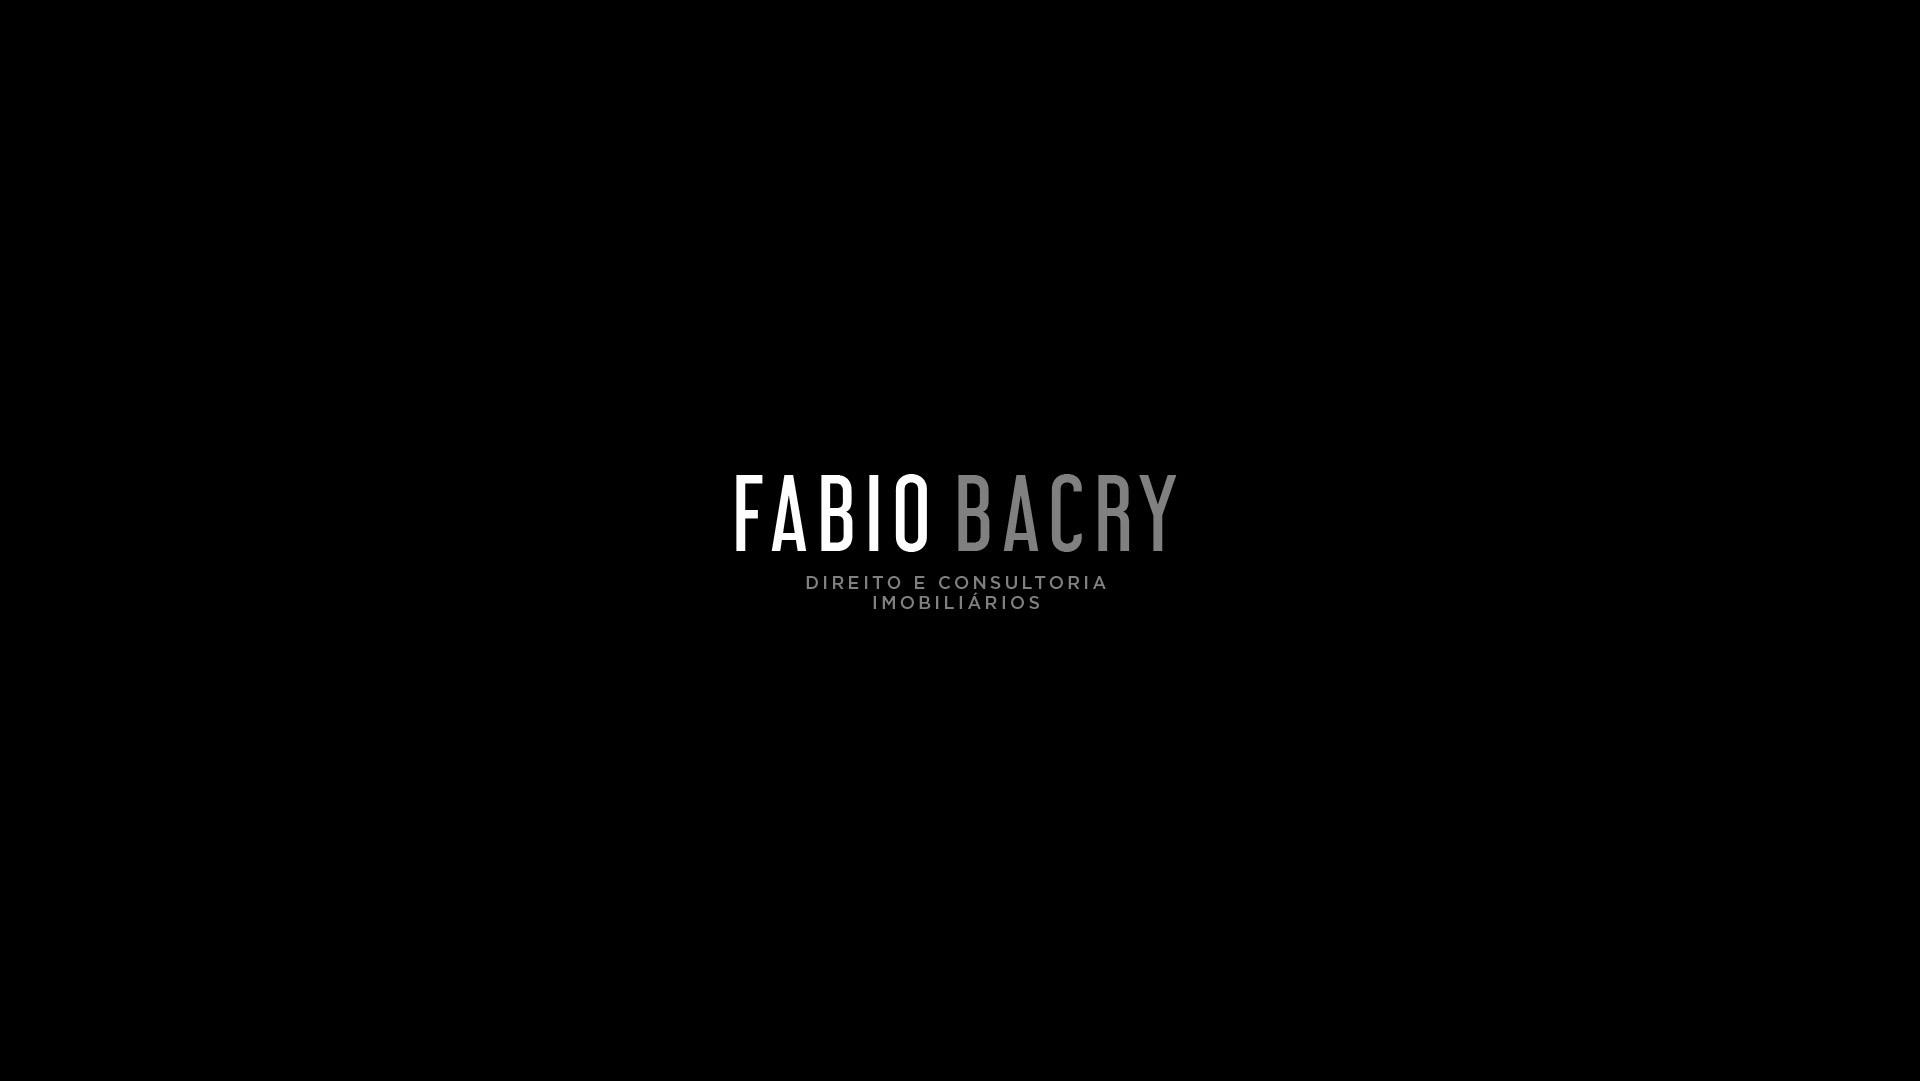 Mockups Fabio Bacry_Prancheta 1 cópia 13